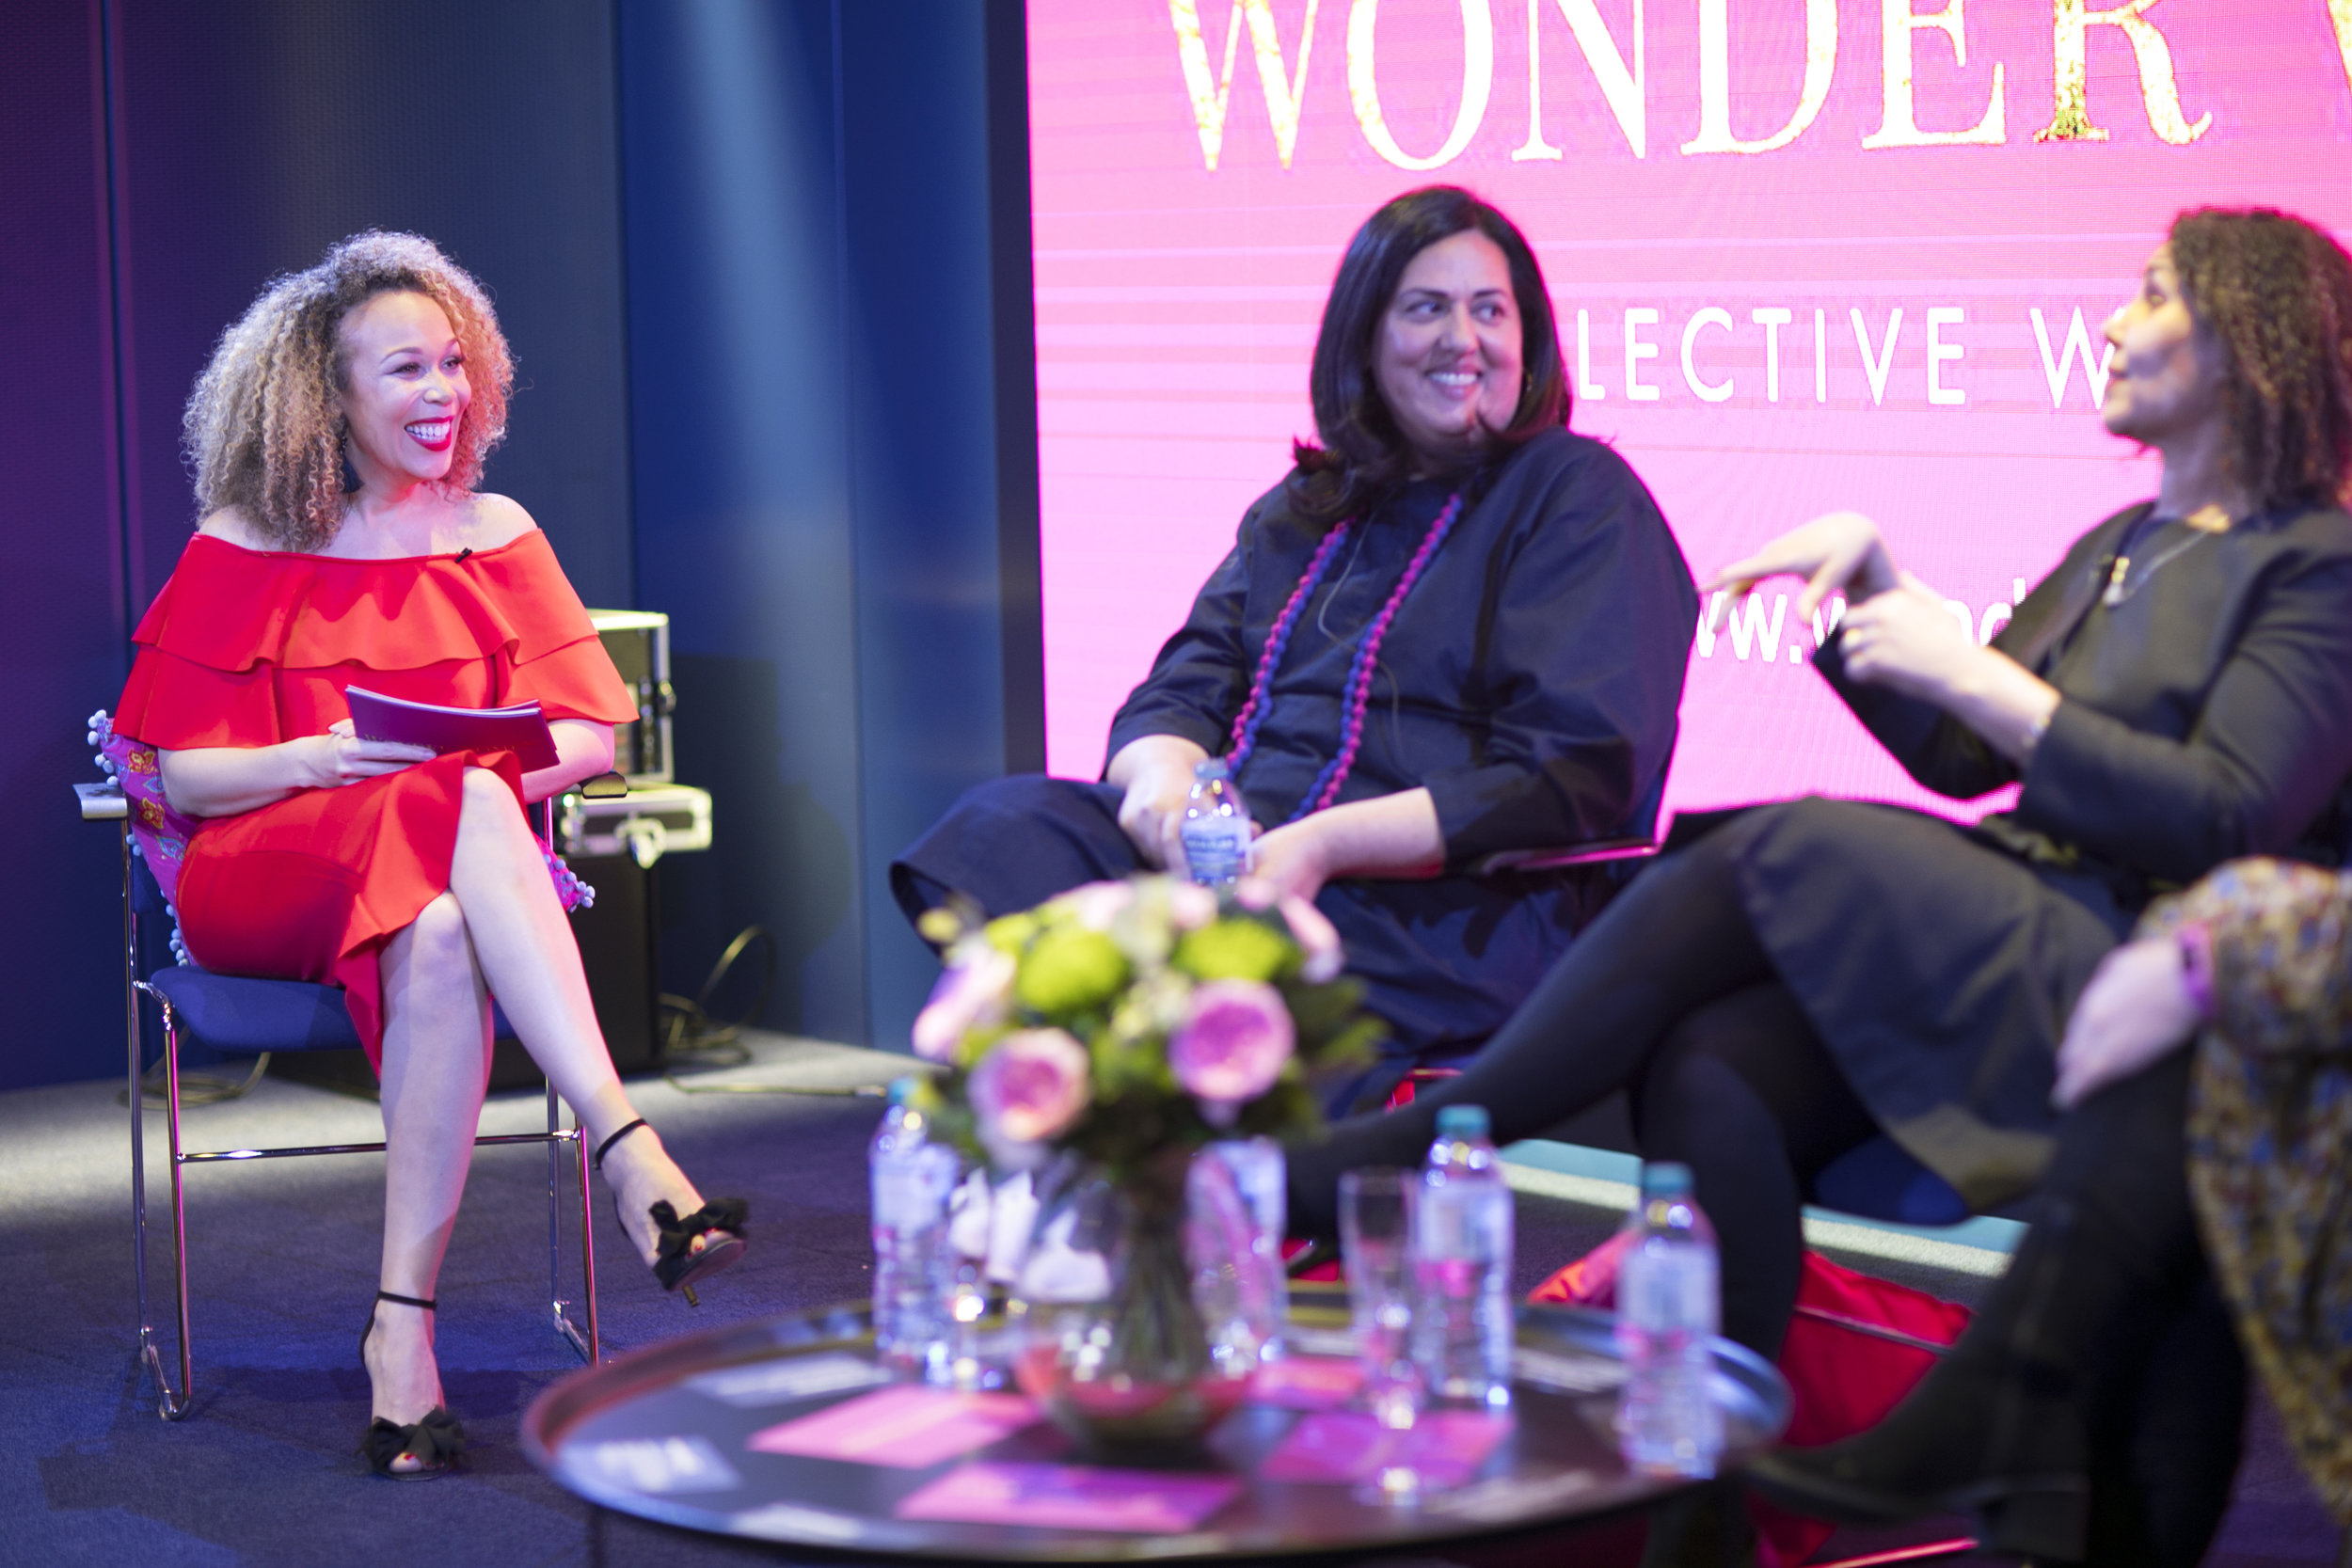 WonderWomen Live!